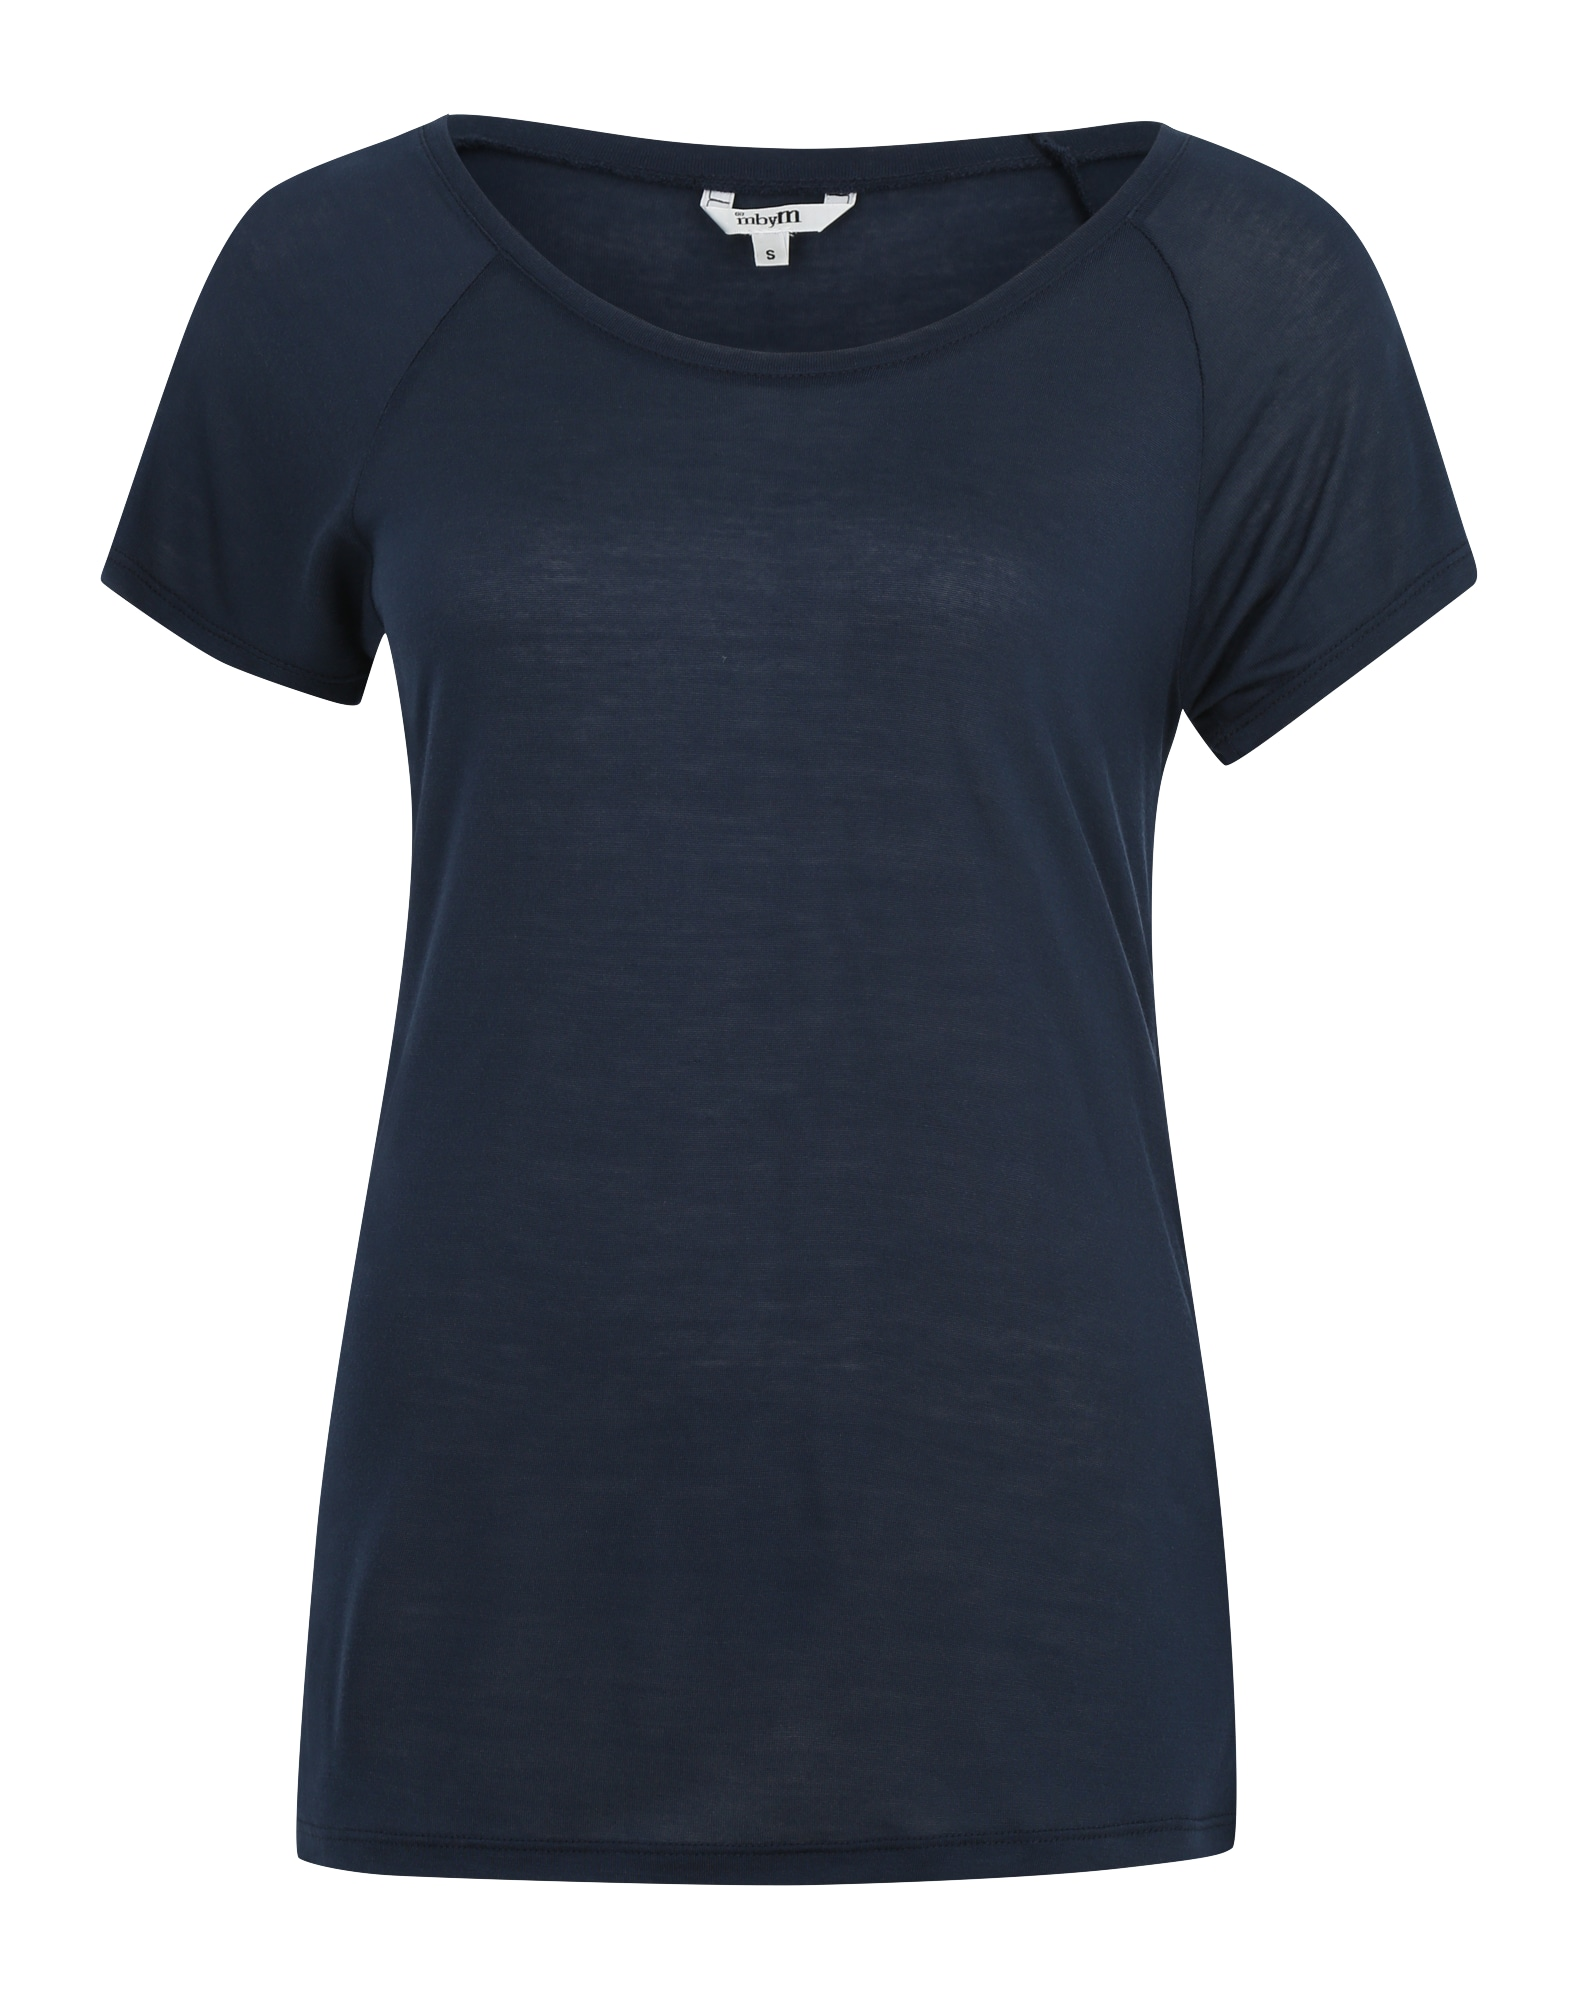 Tričko Galana tmavě modrá Mbym